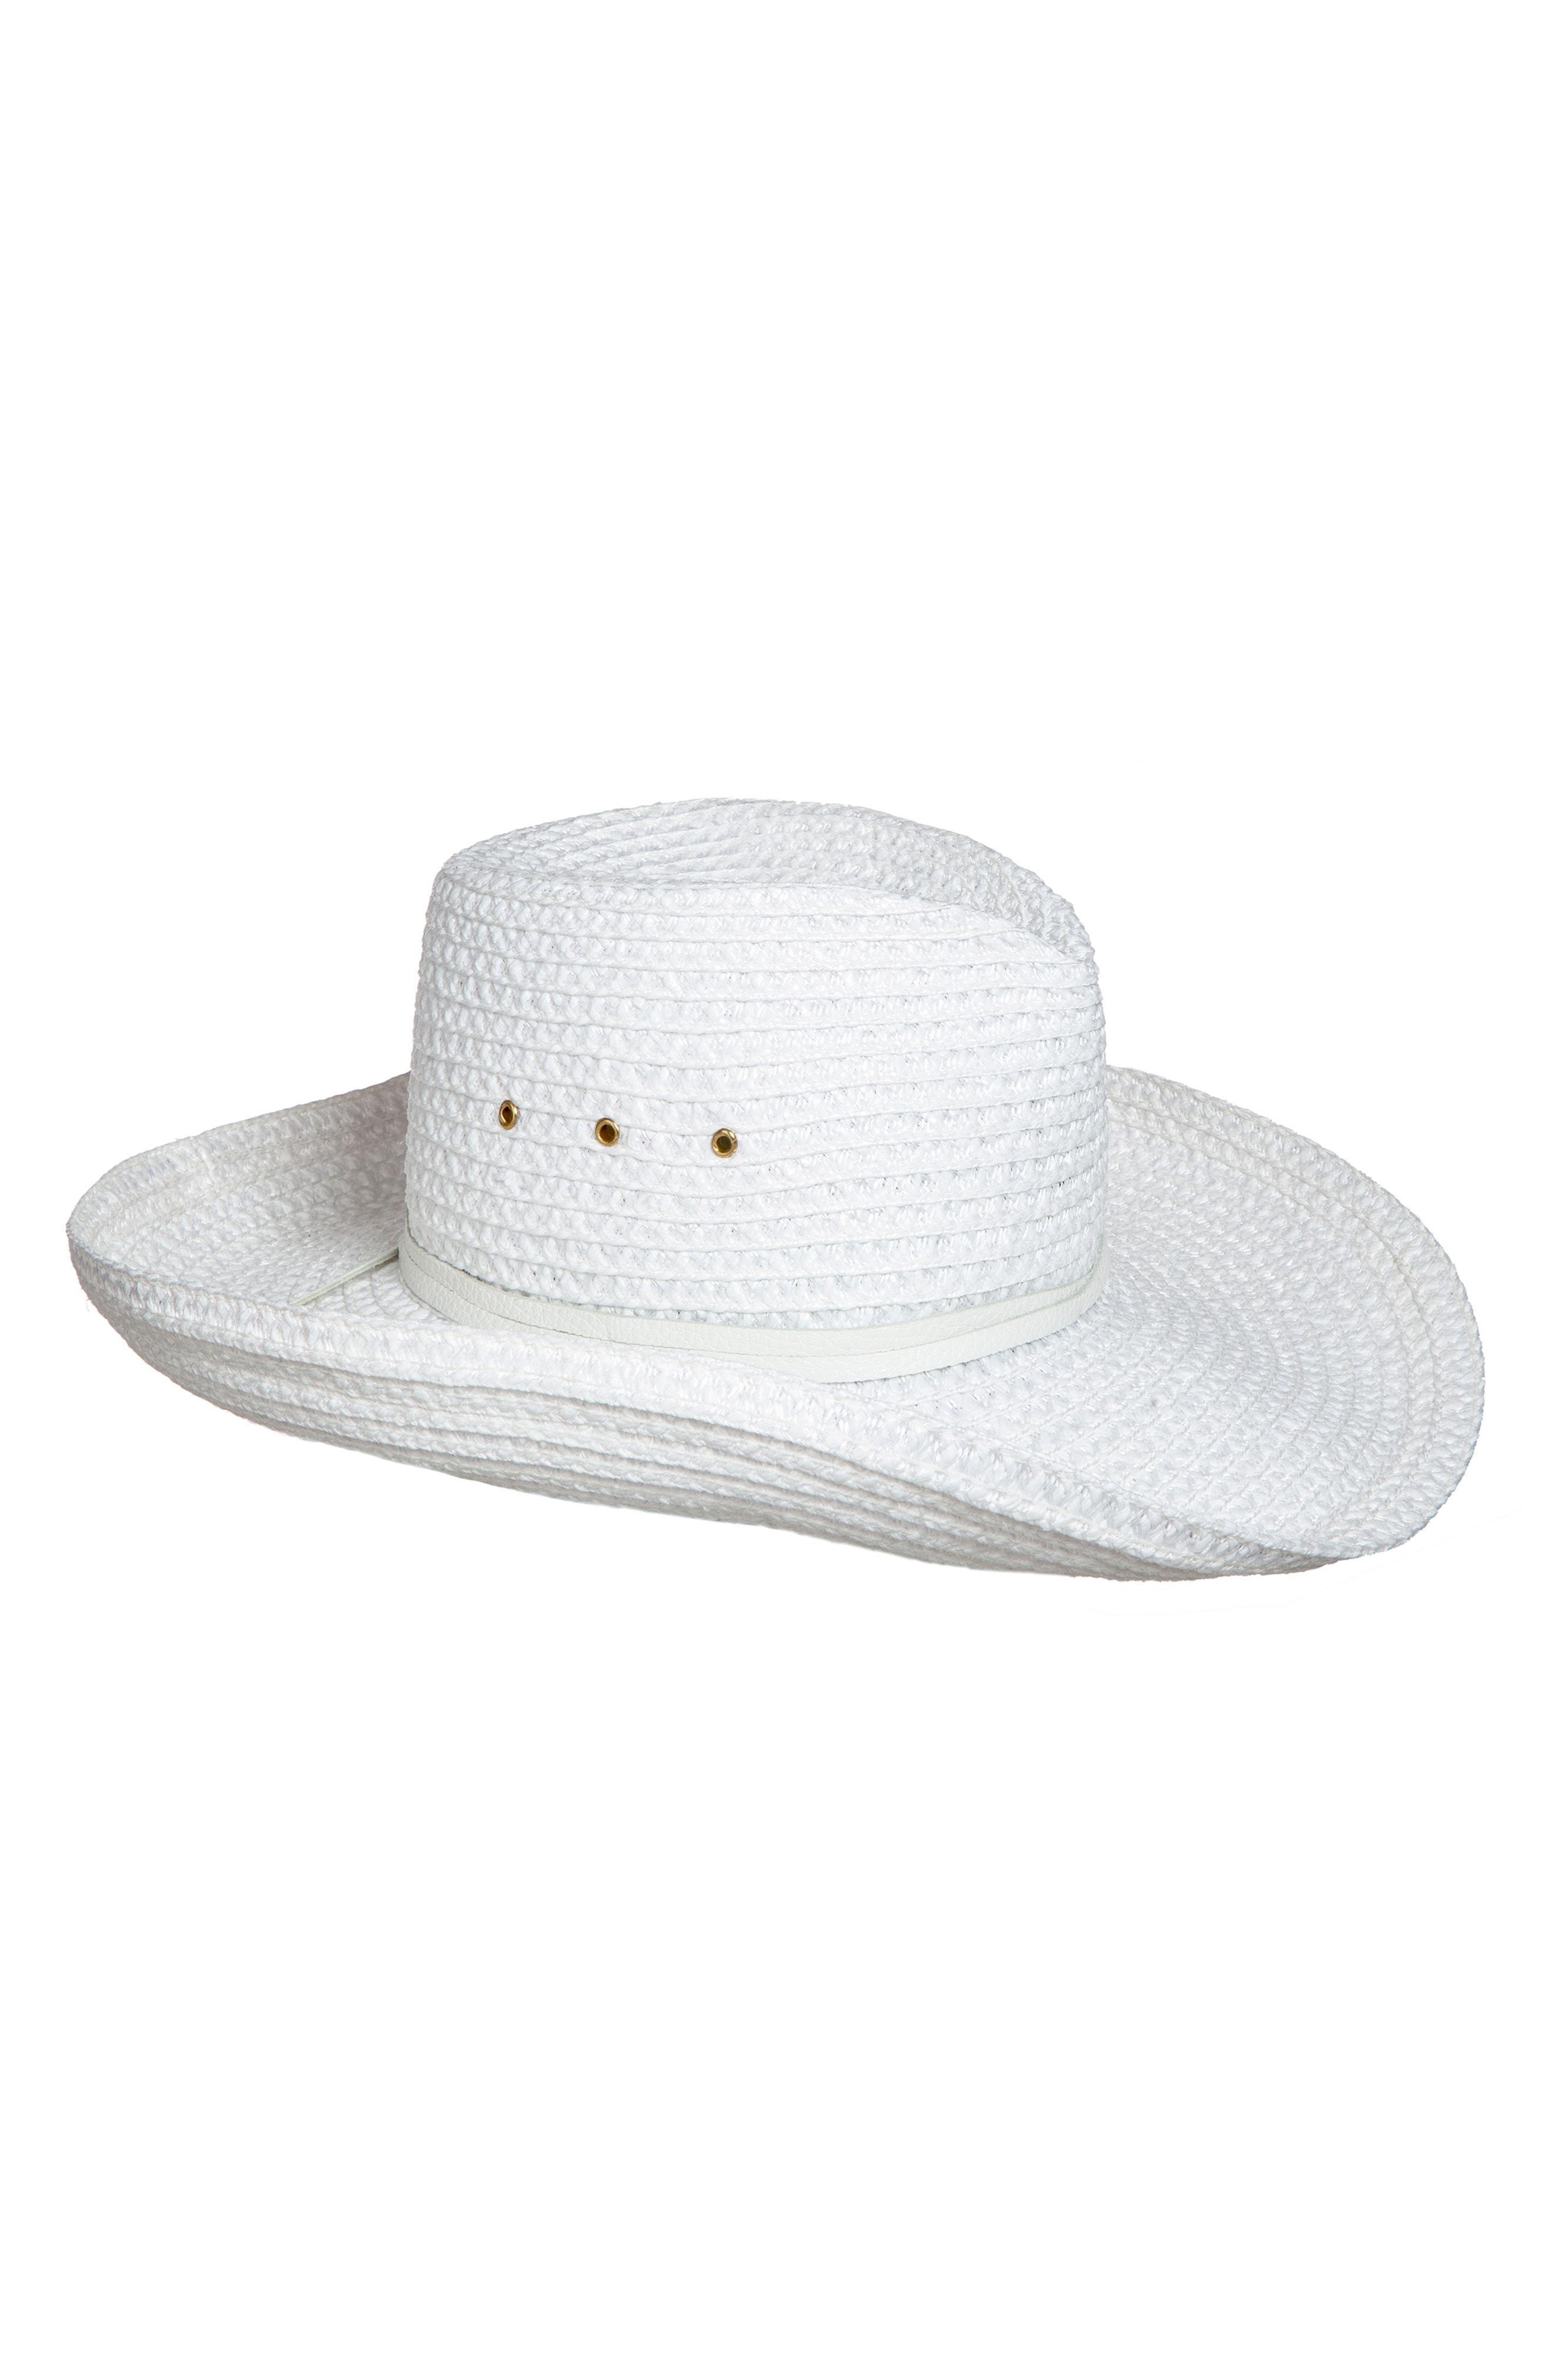 b204fa17fc2 Lyst - Eric Javits Squishee Western Hat in White